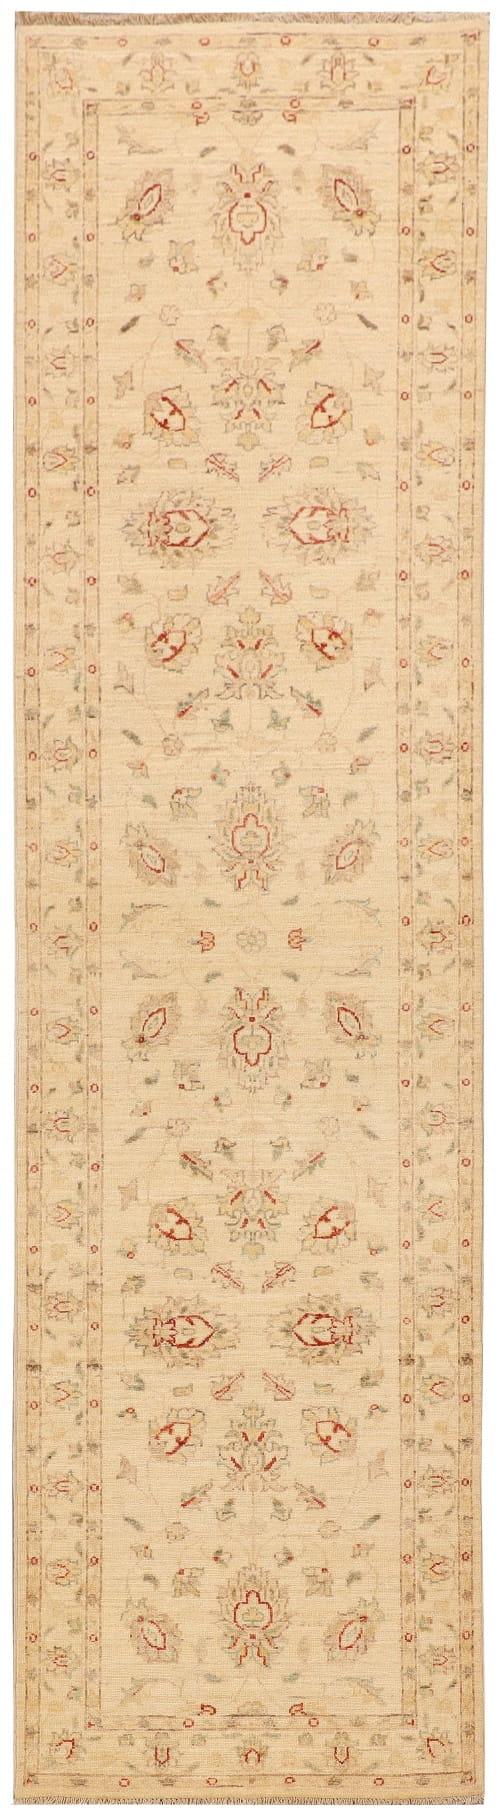 Rug# 26317, Afghan Turkaman,19th c Ziegler inspired, Size 296x80 cm